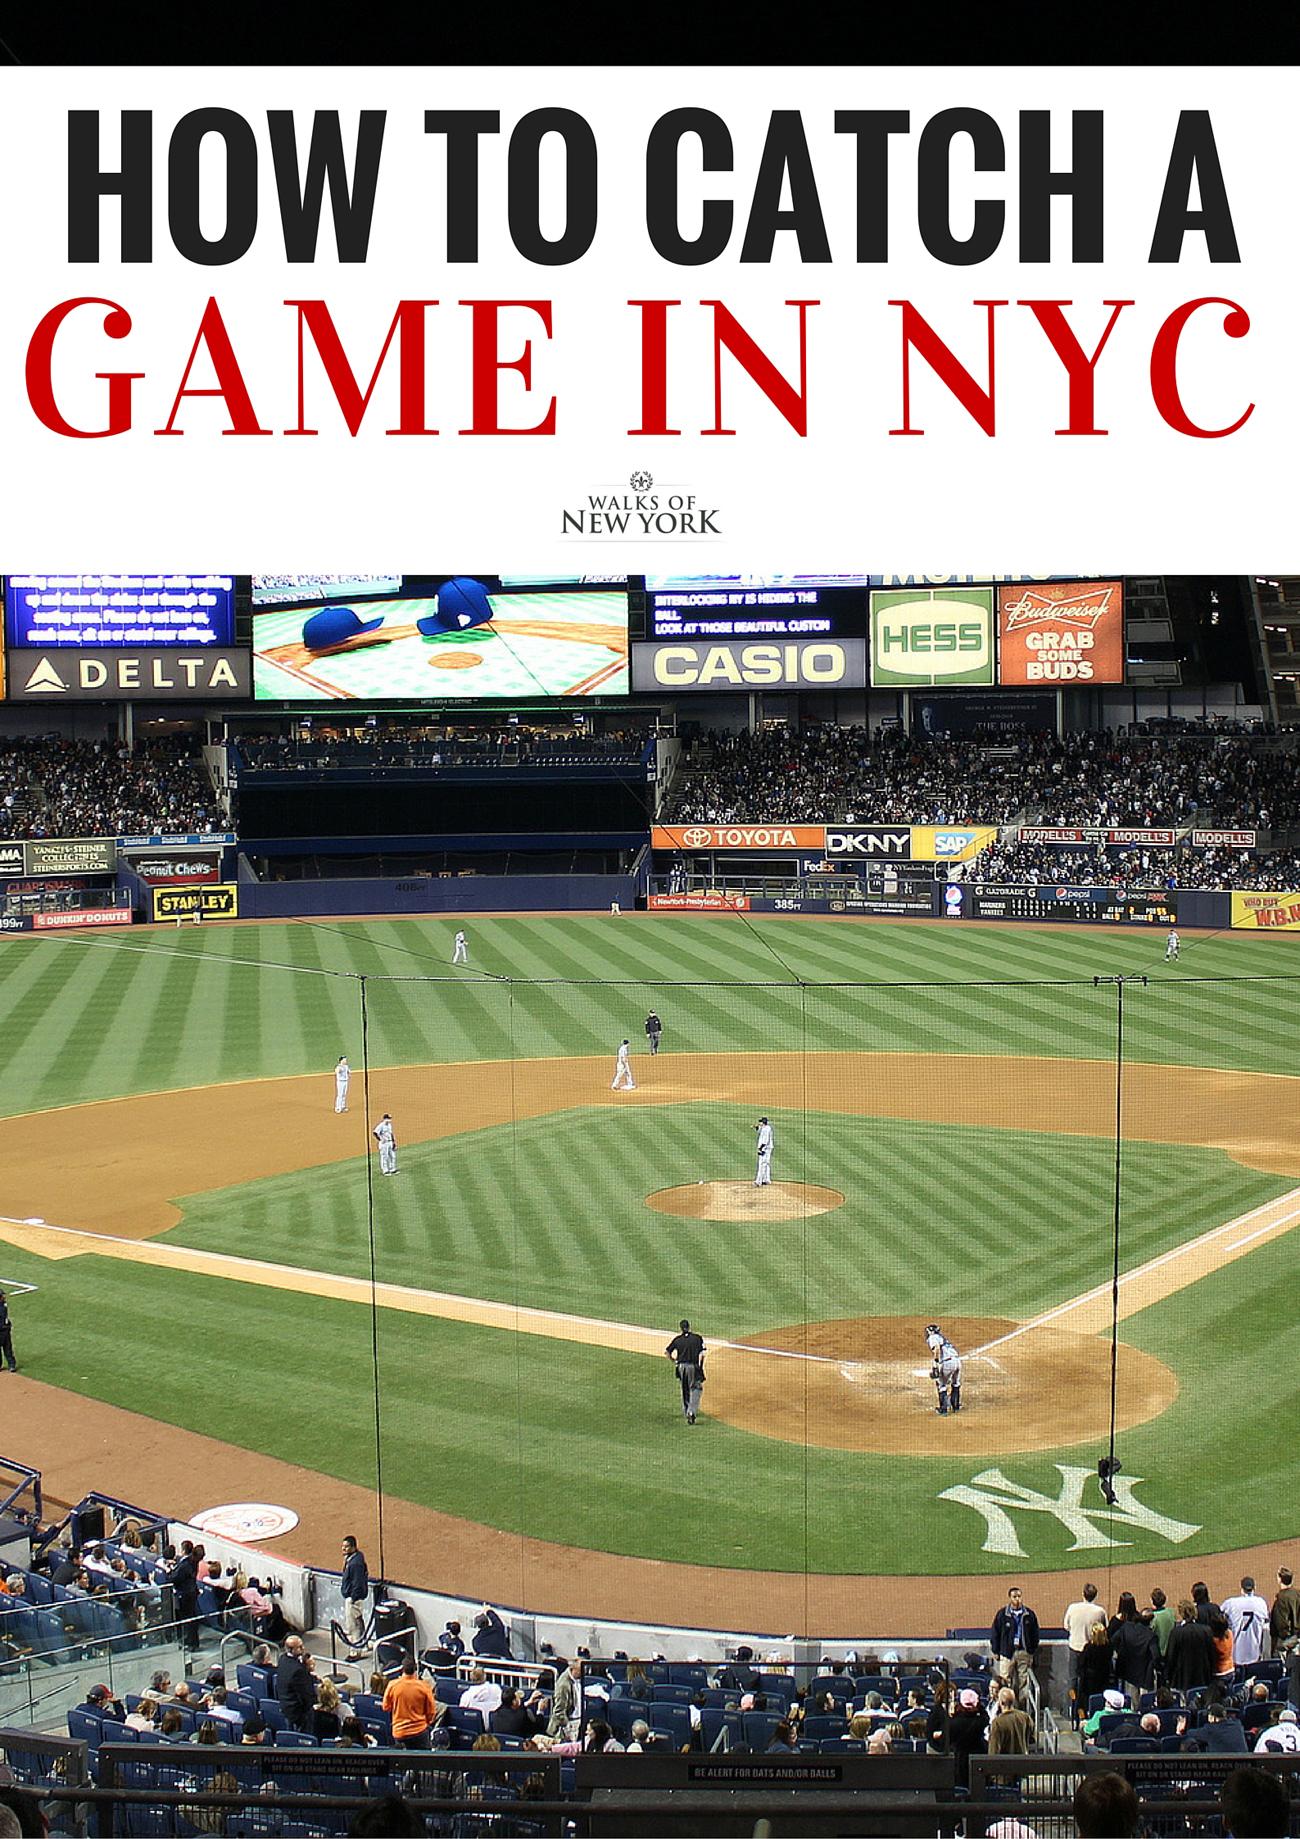 Sporting events in NYC are one of the city's biggest draws. Find out how to catch a game in the Walks of New York blog. | photo by Shinya Suzuki https://www.flickr.com/photos/shinyasuzuki/7179883540/in/photolist-bWsMew-a37Hos-7jRvCw-59cNE6-p34juz-8rWRRb-a34PnD-bWsFZL-bWsJL1-bWsFVy-bWsHXb-bWsJQA-bWsFB1-bWsMhC-bWsHNs-bWsGgm-bWsFKS-a37EEE-e7XNGN-bWsKoh-5mgein-a34RdB-enDDBd-bWsFQY-enFo4Y-5eSHnZ-5mgetT-4Fexjz-a37ErY-59h1ny-87P99x-bWsGDA-bWsLQm-bWsGbC-a34QLM-bWsJvs-bWsJyC-a34UDx-bWsJCL-7jRwxY-5LhThw-eE7QQr-bWsFuU-bWsKhd-a37DYC-bWsLVw-bWsM4W-bWsLZh-bWsLL9-bWsKdf